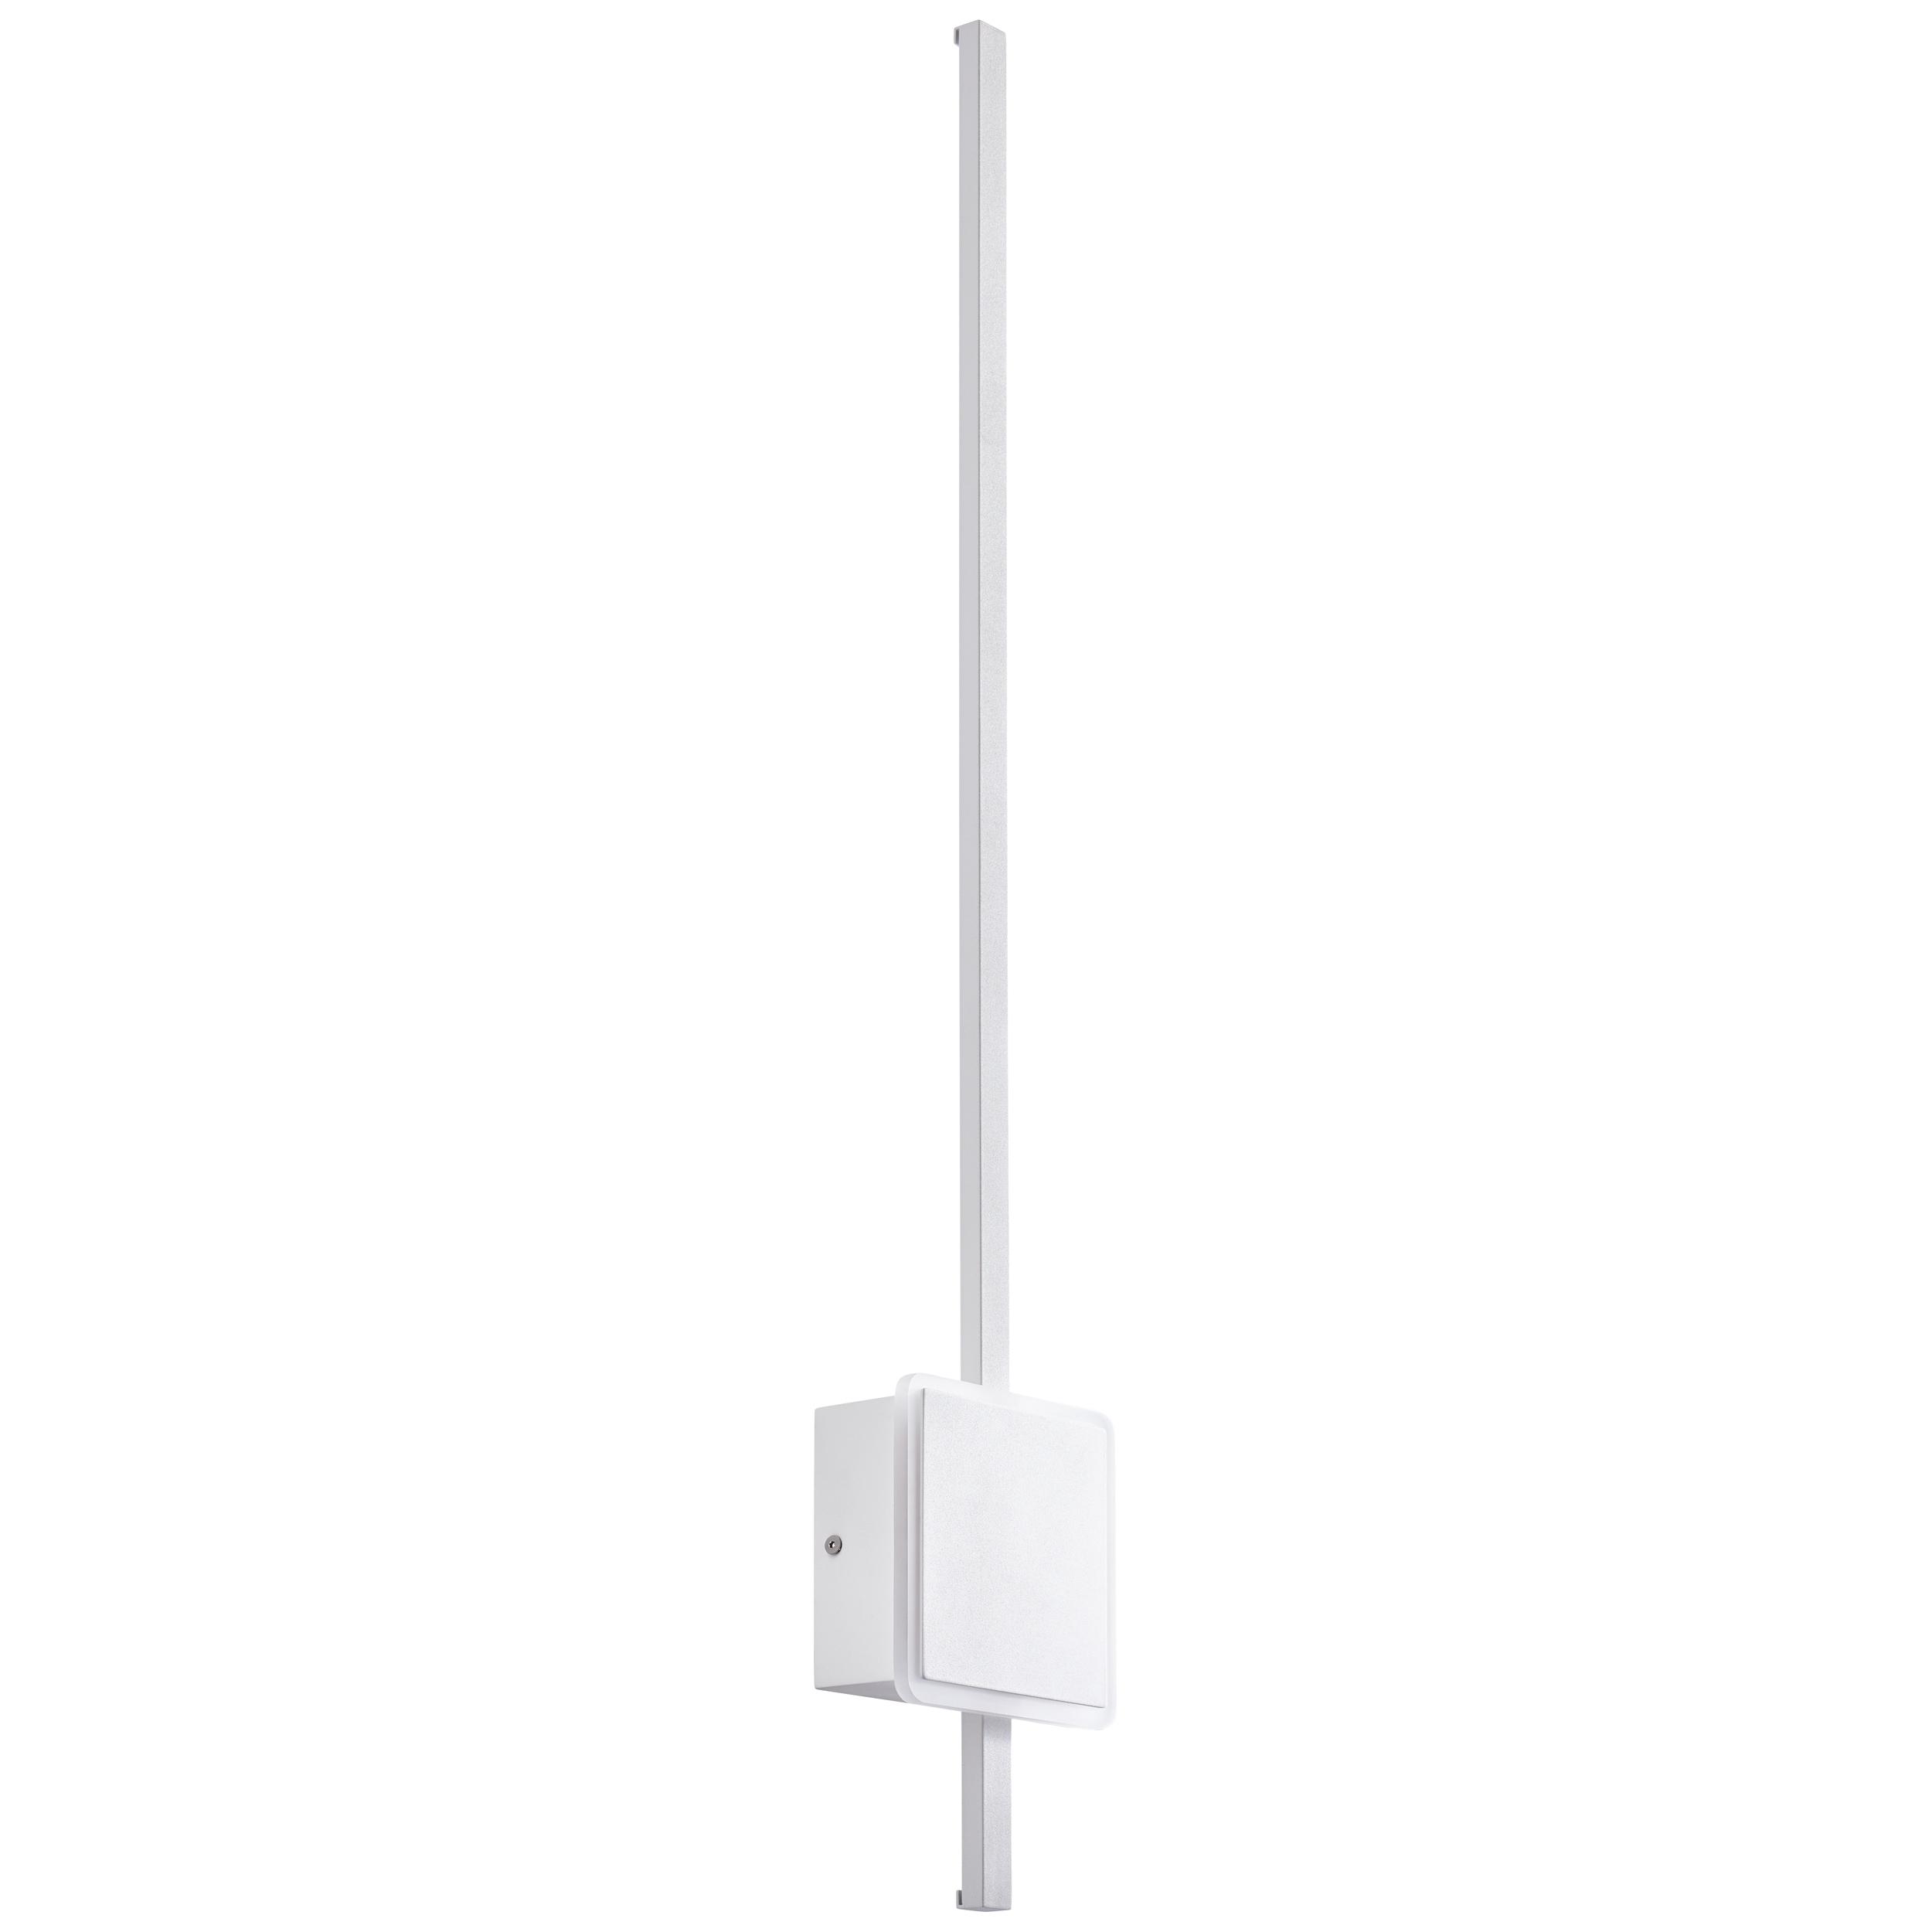 AEG Inessa LED Wandleuchte 82cm sand/weiß